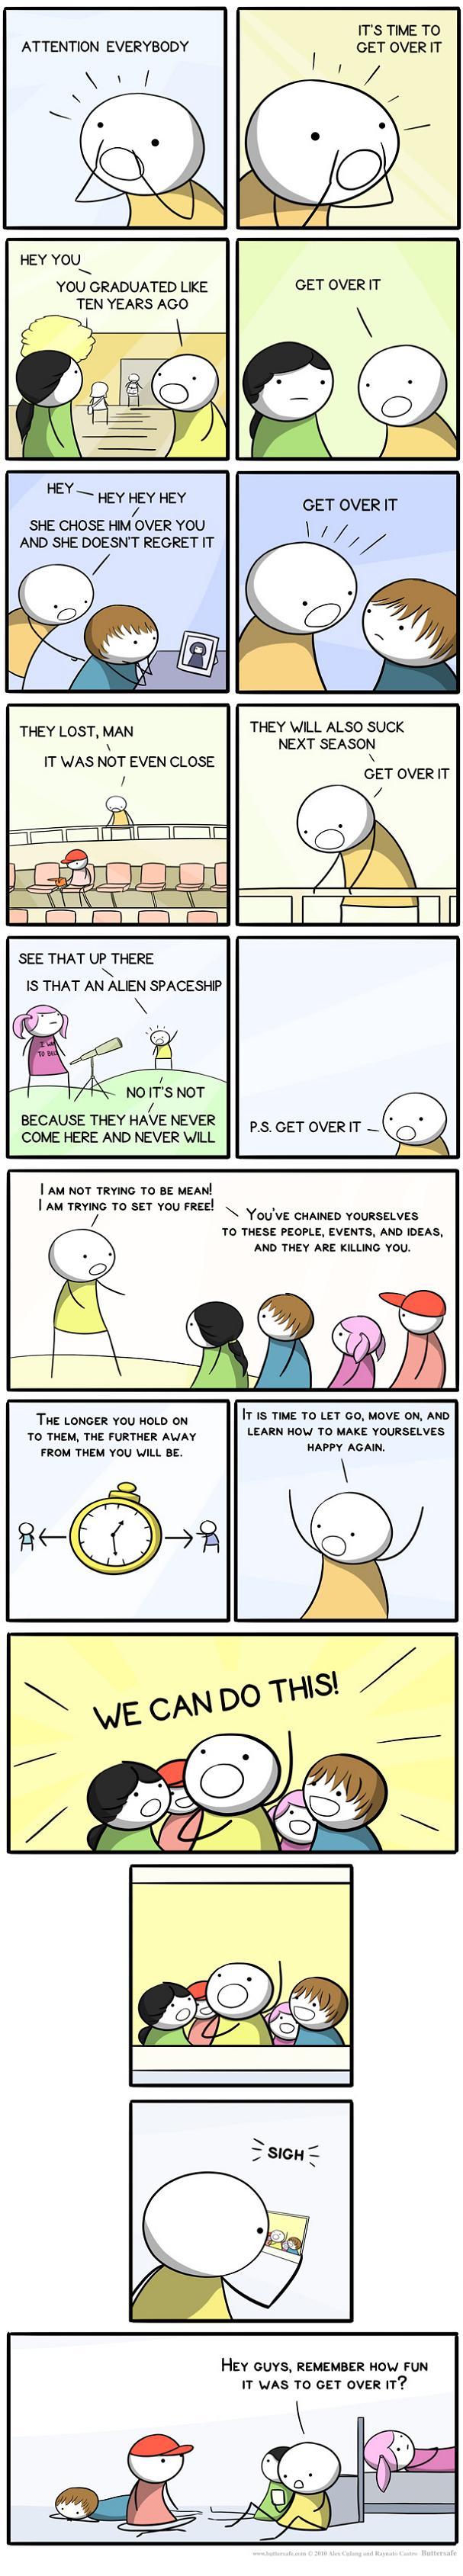 get over it comic Get Over It [Comic Strip]